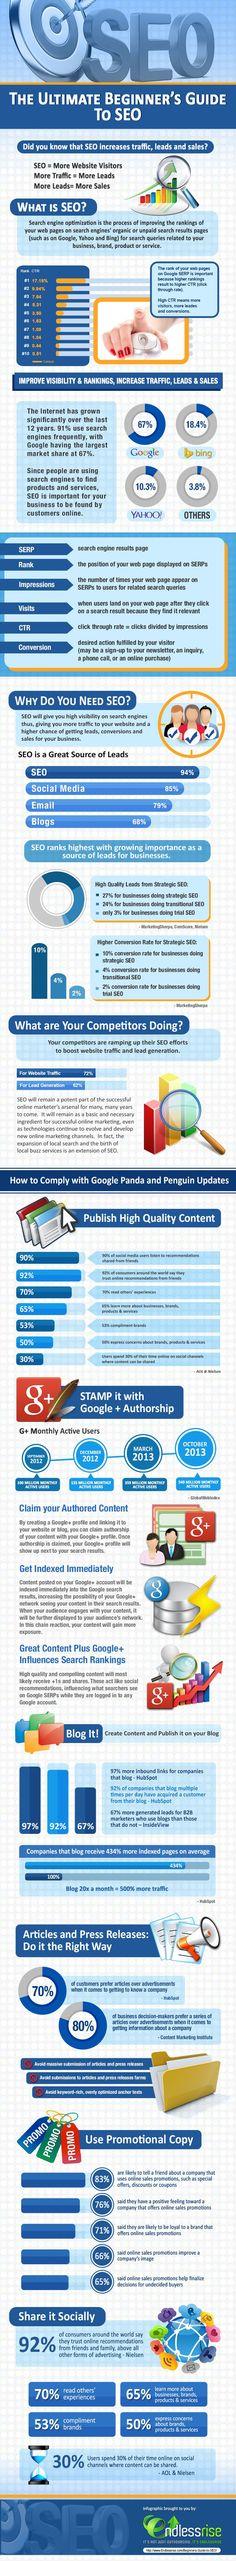 Online Marketing Infographics 2014 #searchengineoptimization